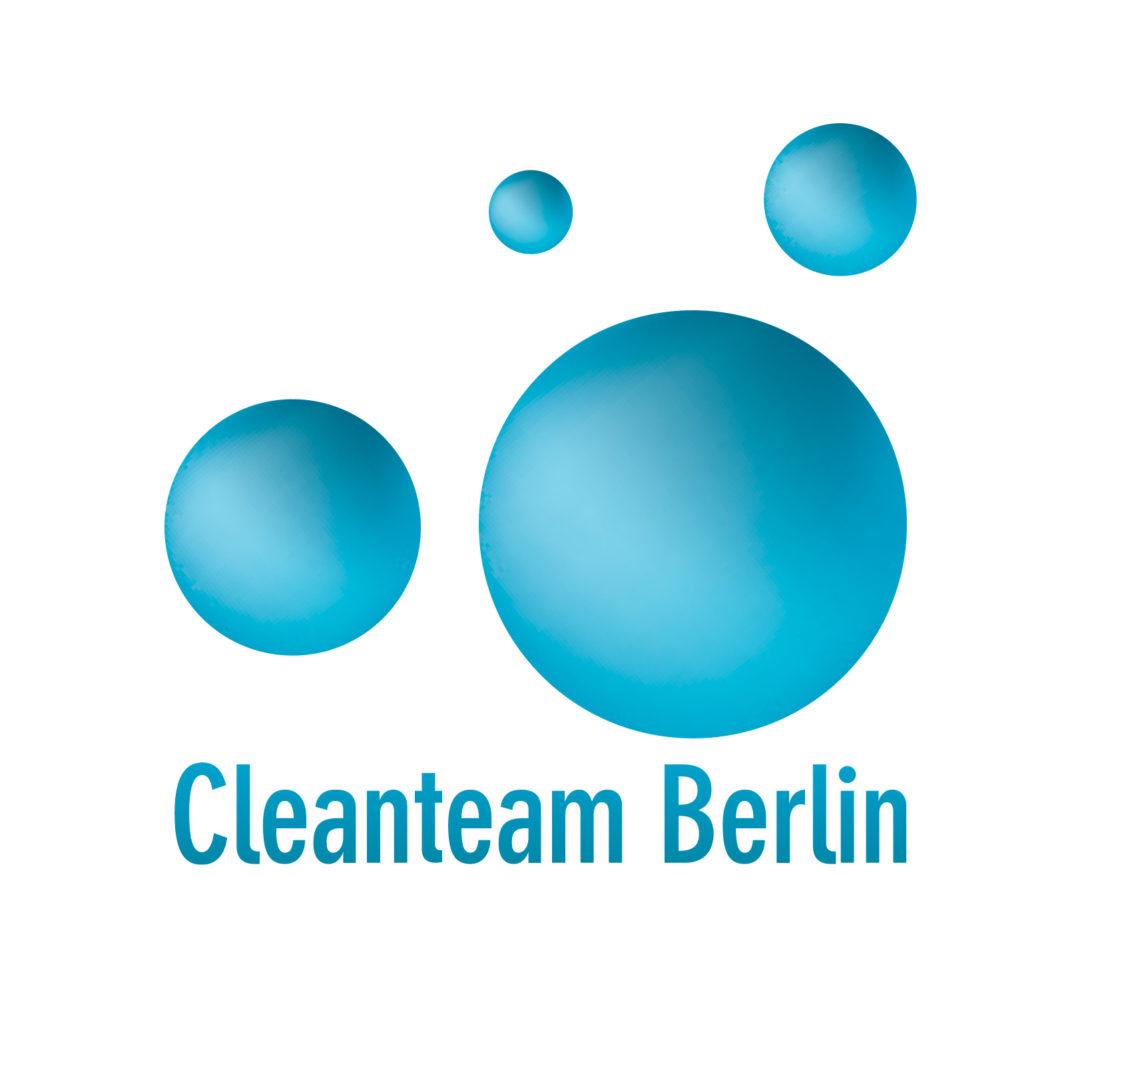 Cleanteam Berlin logo